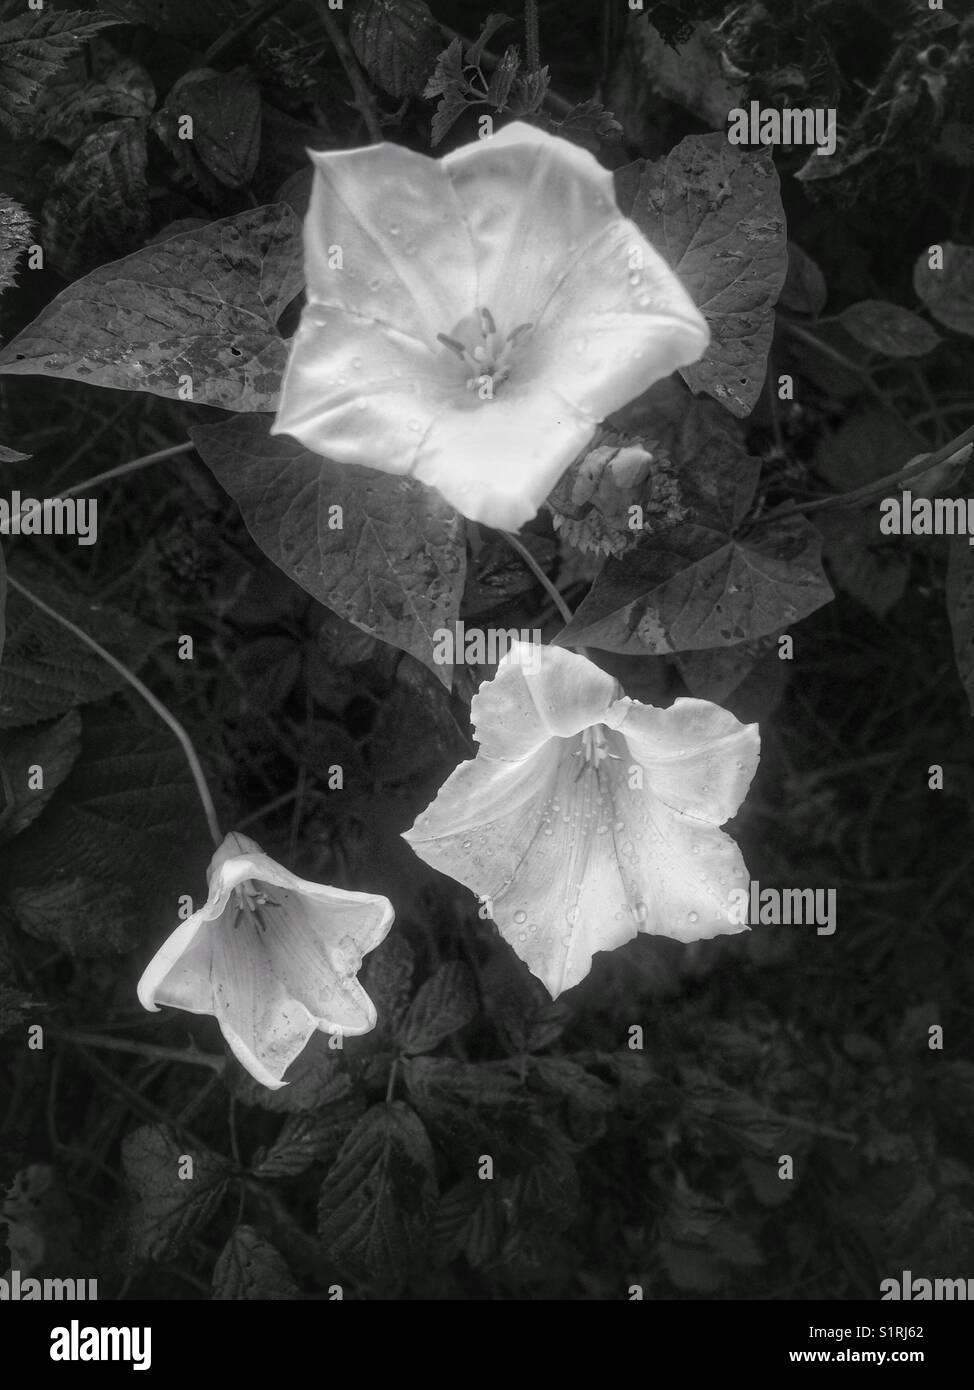 Trumpet wild flowers stock photos trumpet wild flowers stock white trumpet flowers of bindweed stock image mightylinksfo